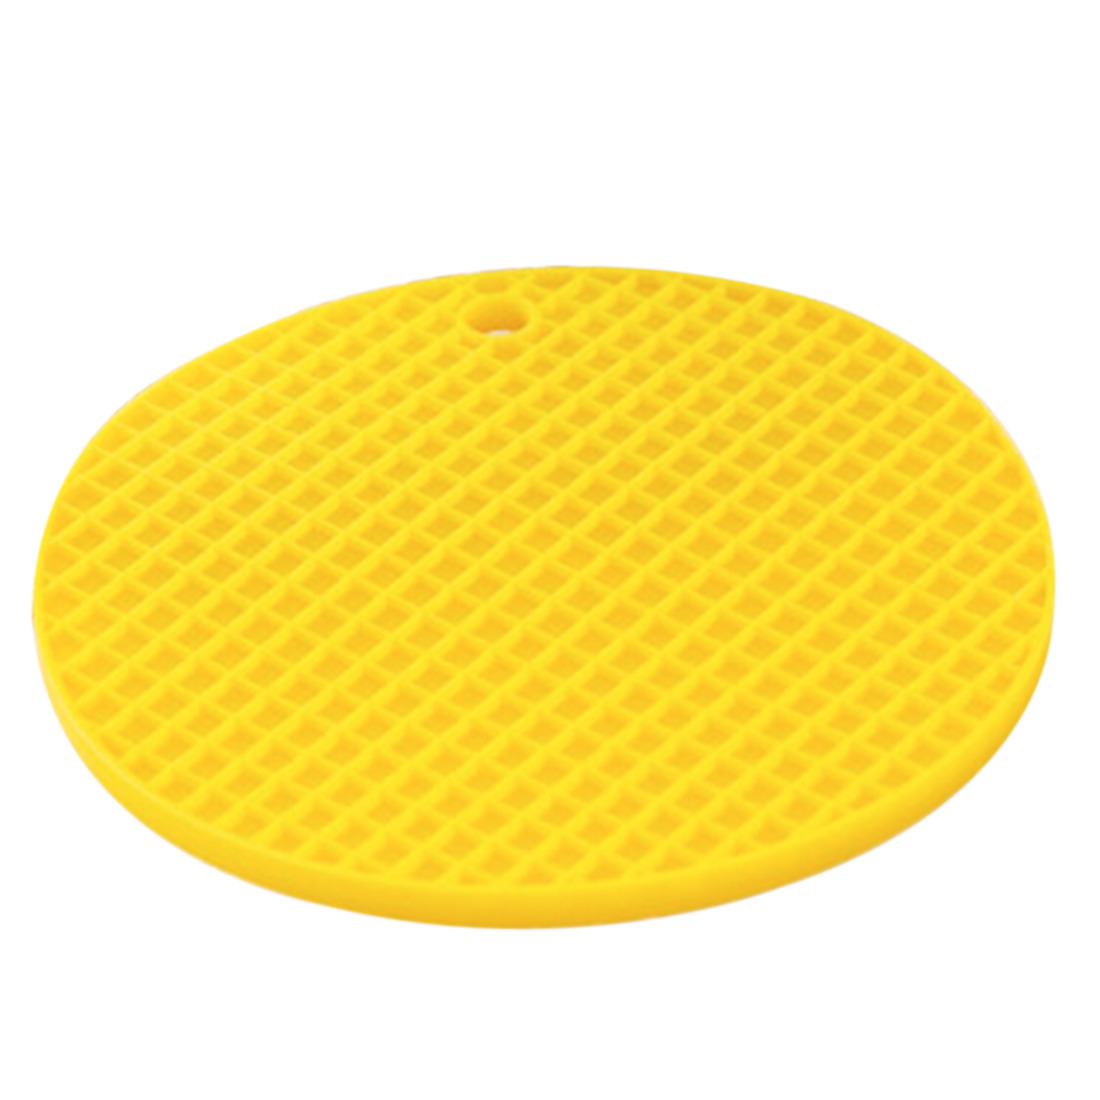 new Silicone Heat proof Mats Pot Bowl Dish Table Pad  : 1187H0269 from www.ebay.com size 1100 x 1100 jpeg 134kB